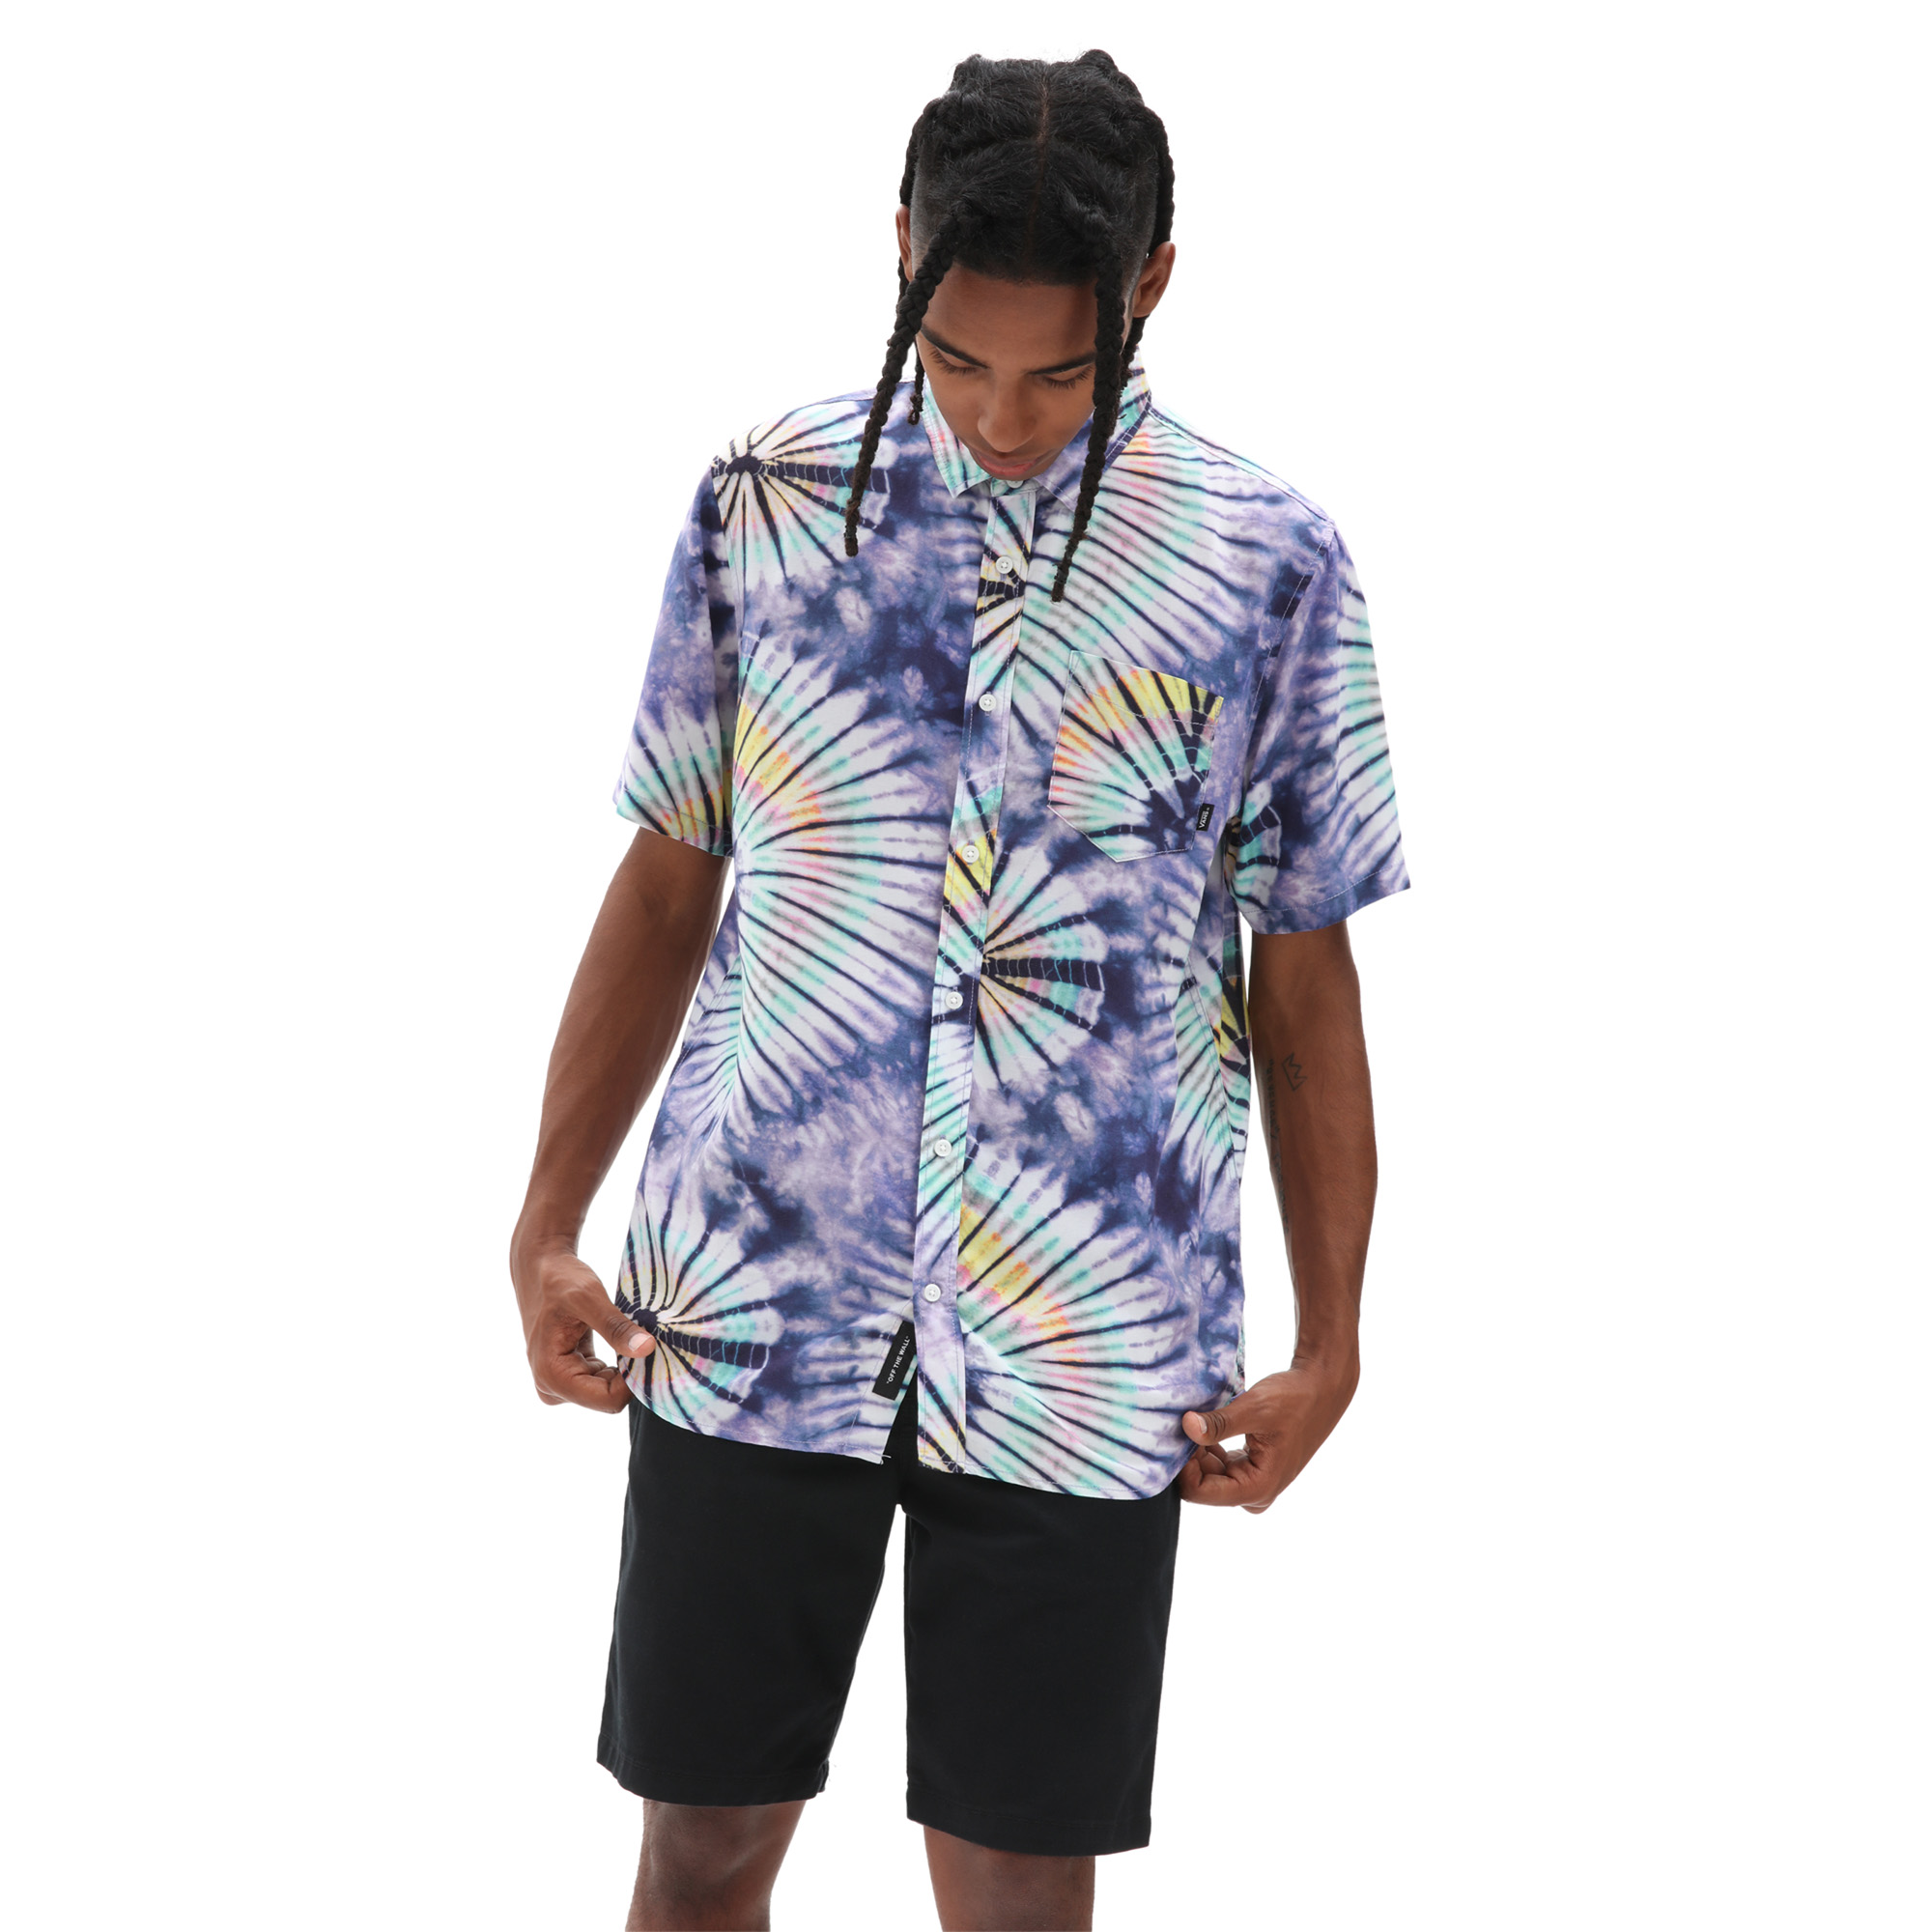 XL NWT KROME $72 ANARCHY Tie Dye Black Pullover Sweatshirt Sweater